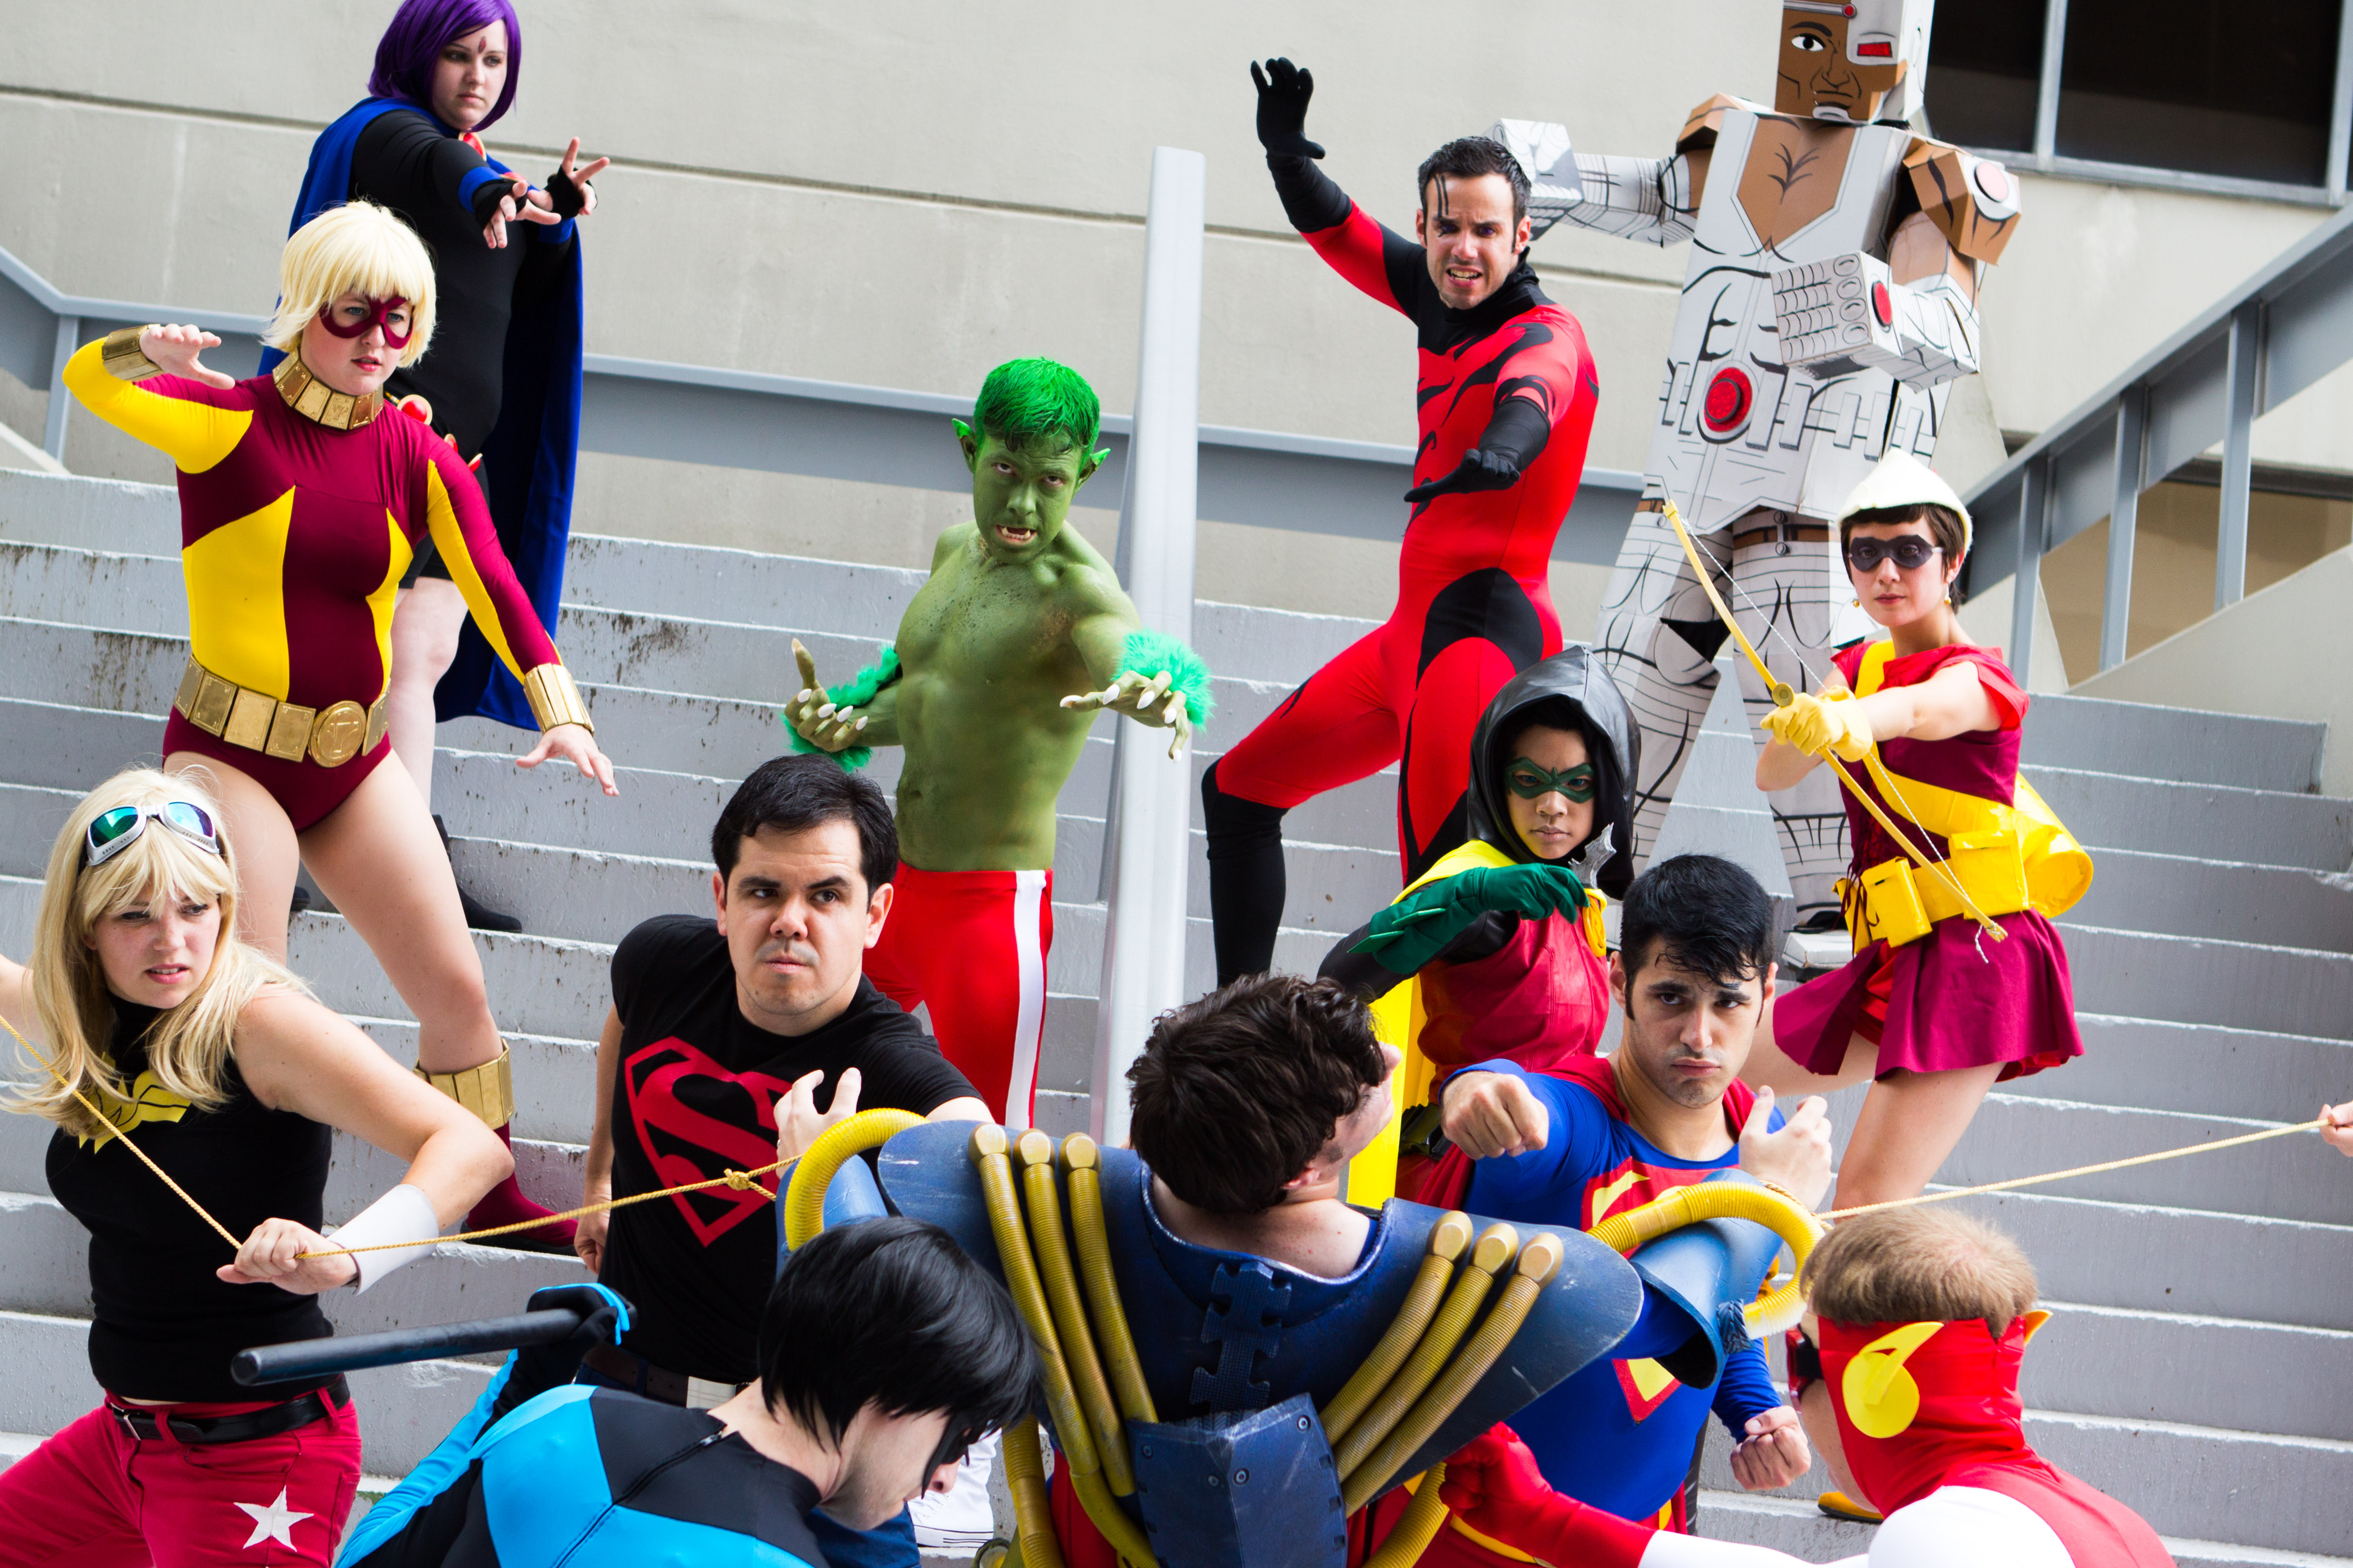 File:Dragon Con 2013 - Teen Titans vs Superboy Prime (9697038194).jpg - Wikimedia Commons